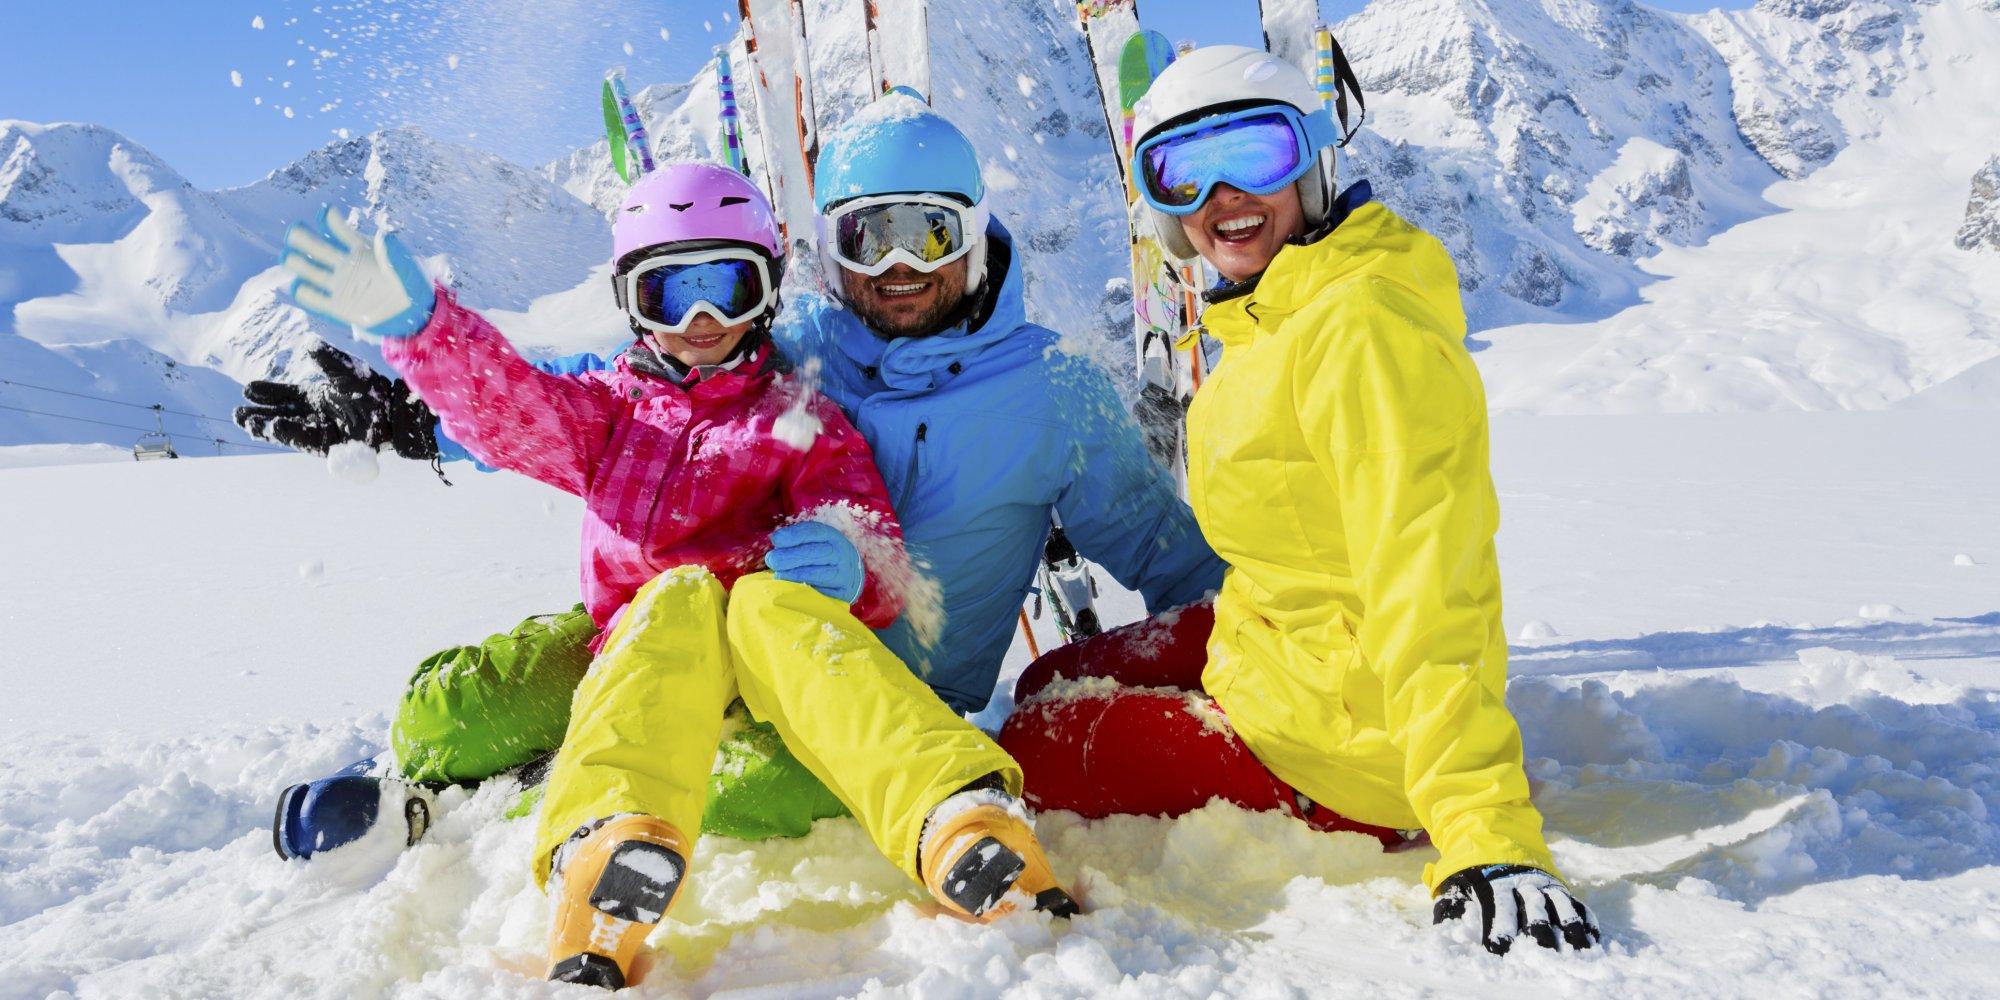 Canadas Top 5 FamilyFriendly Ski Resorts  Allison Eberle